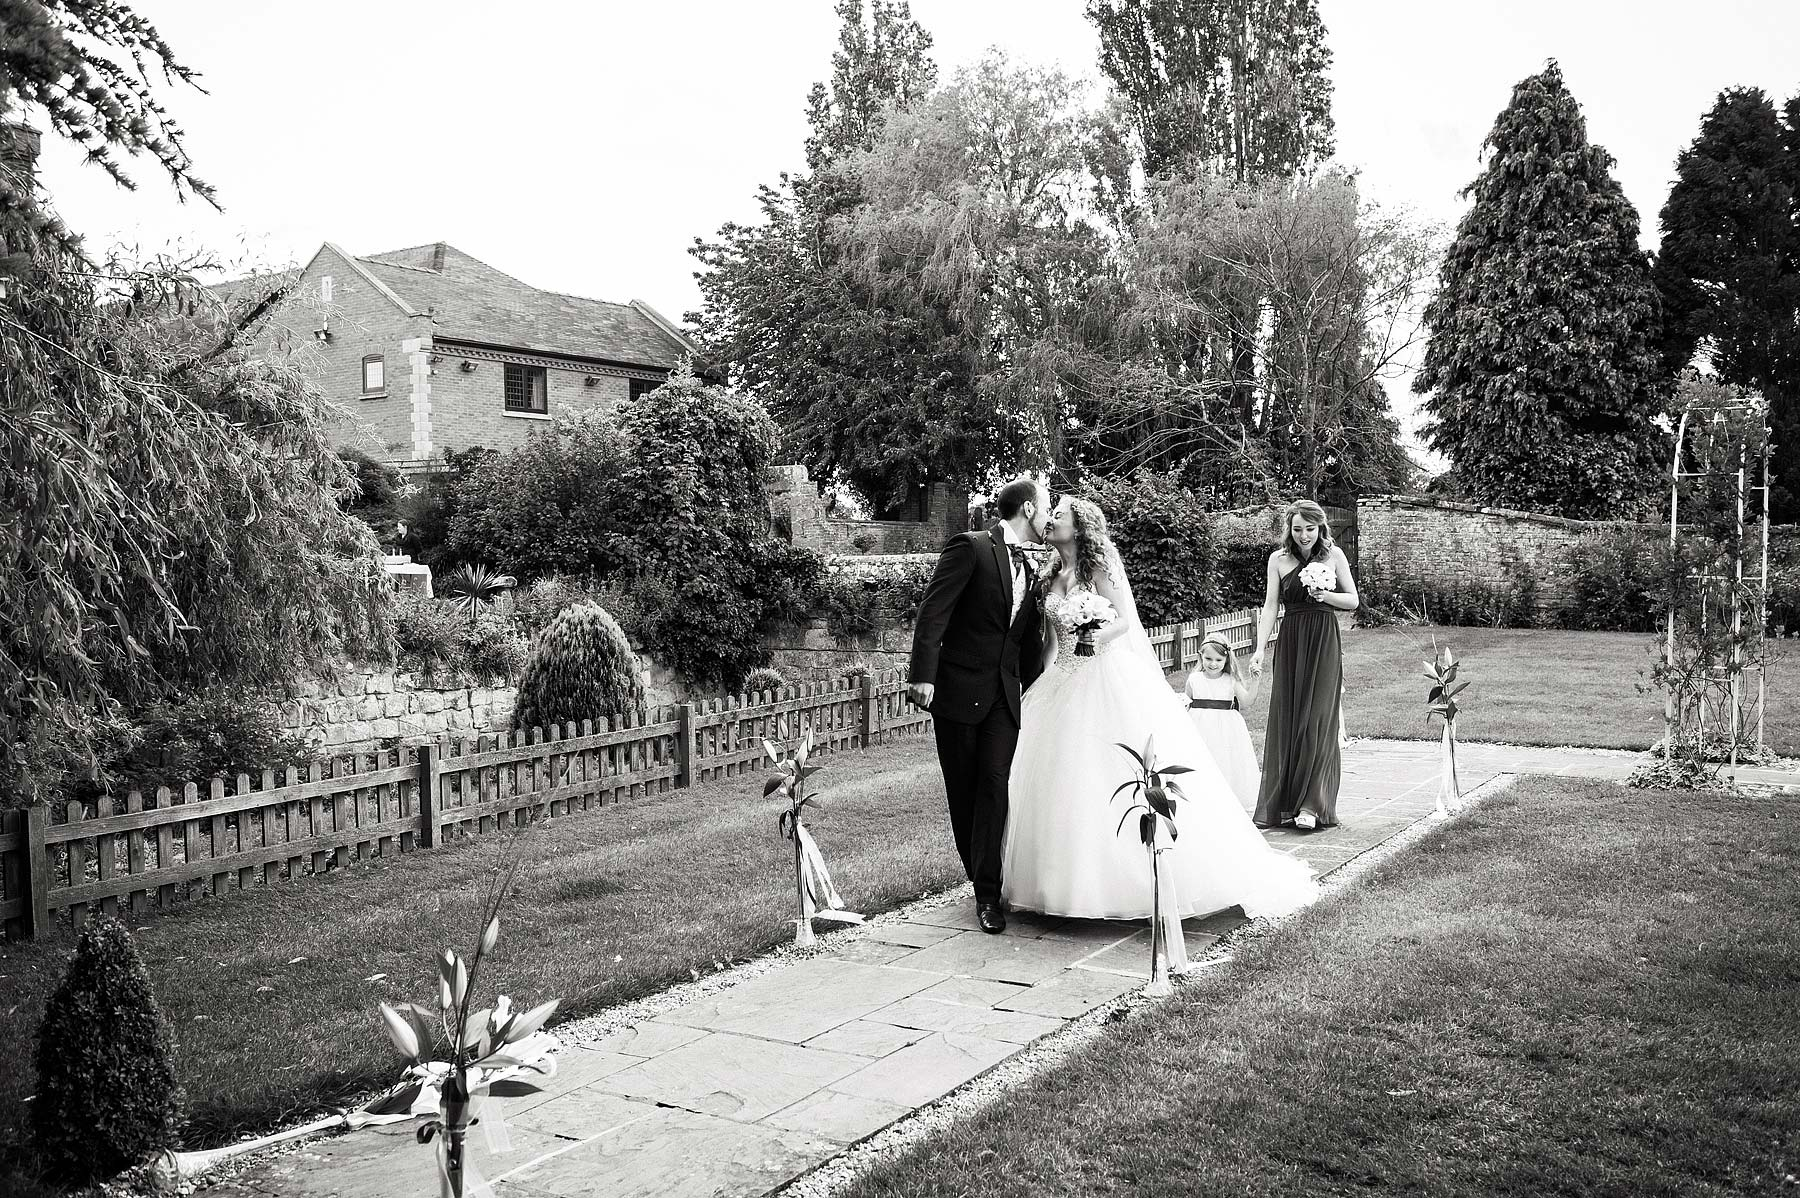 albright-hussey-manor-wedding-photographers-036